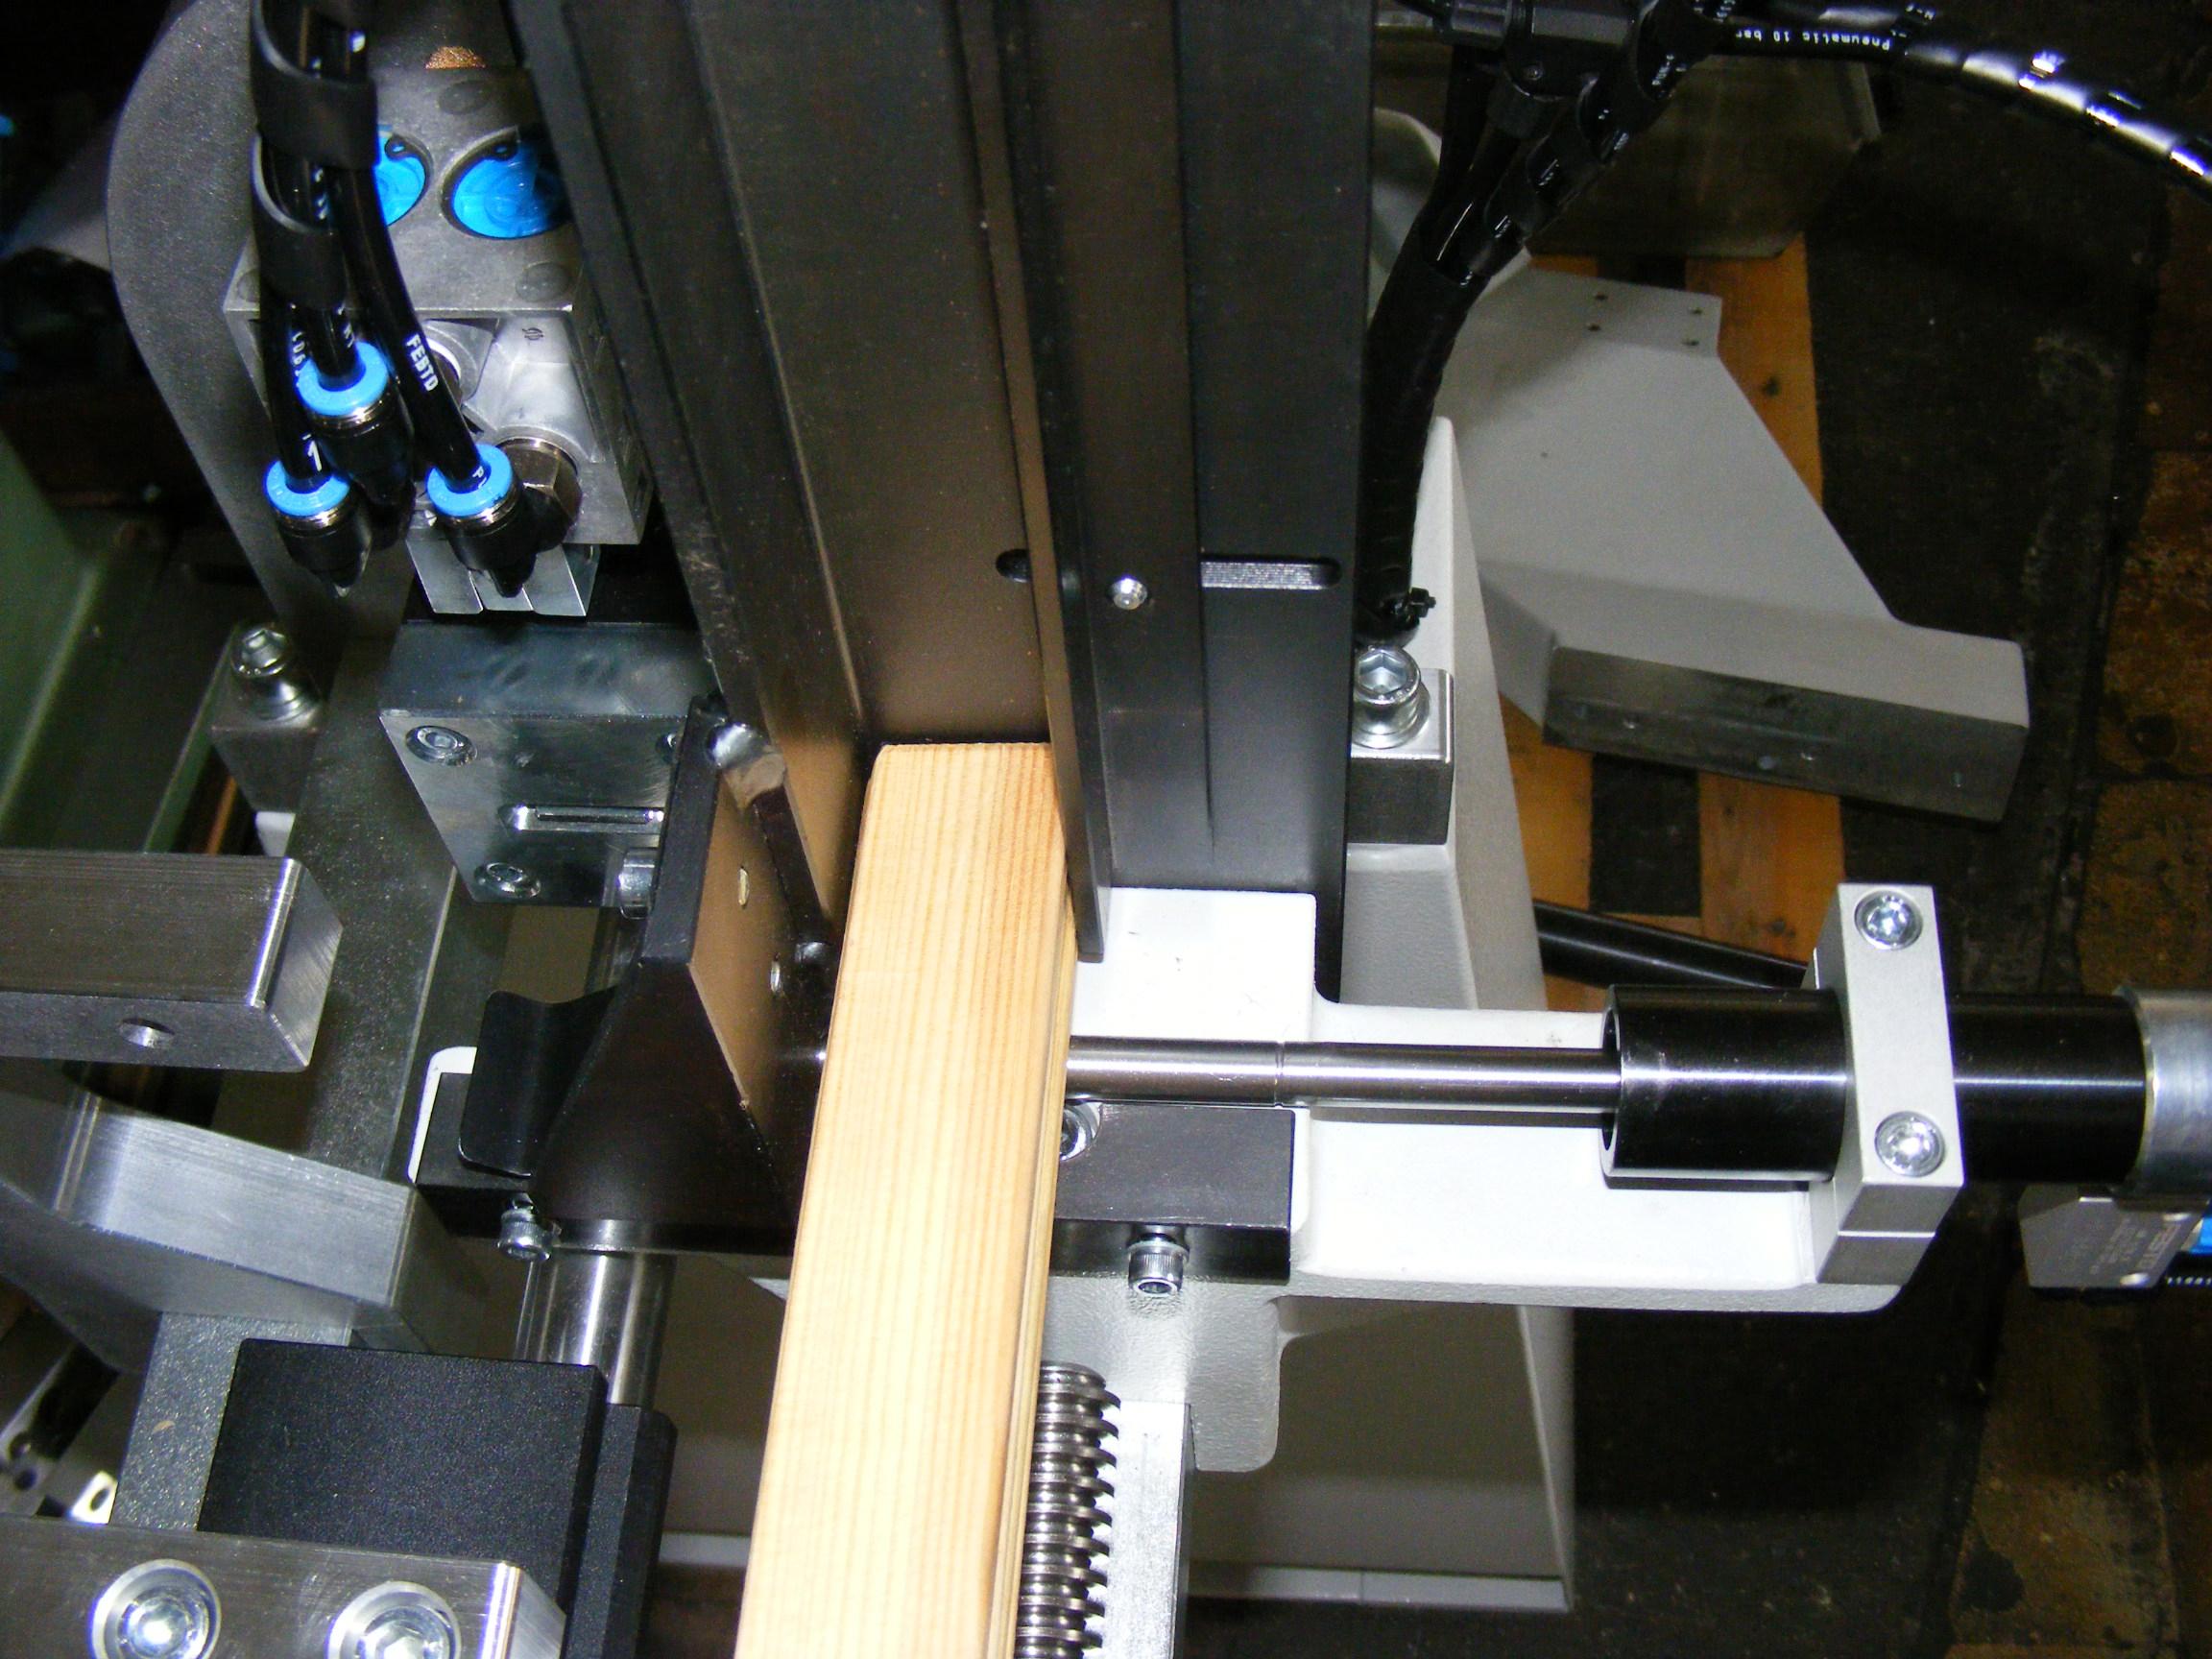 hoffmann-ag-3-automated-slat-chamfering-machine-detail-3.jpg